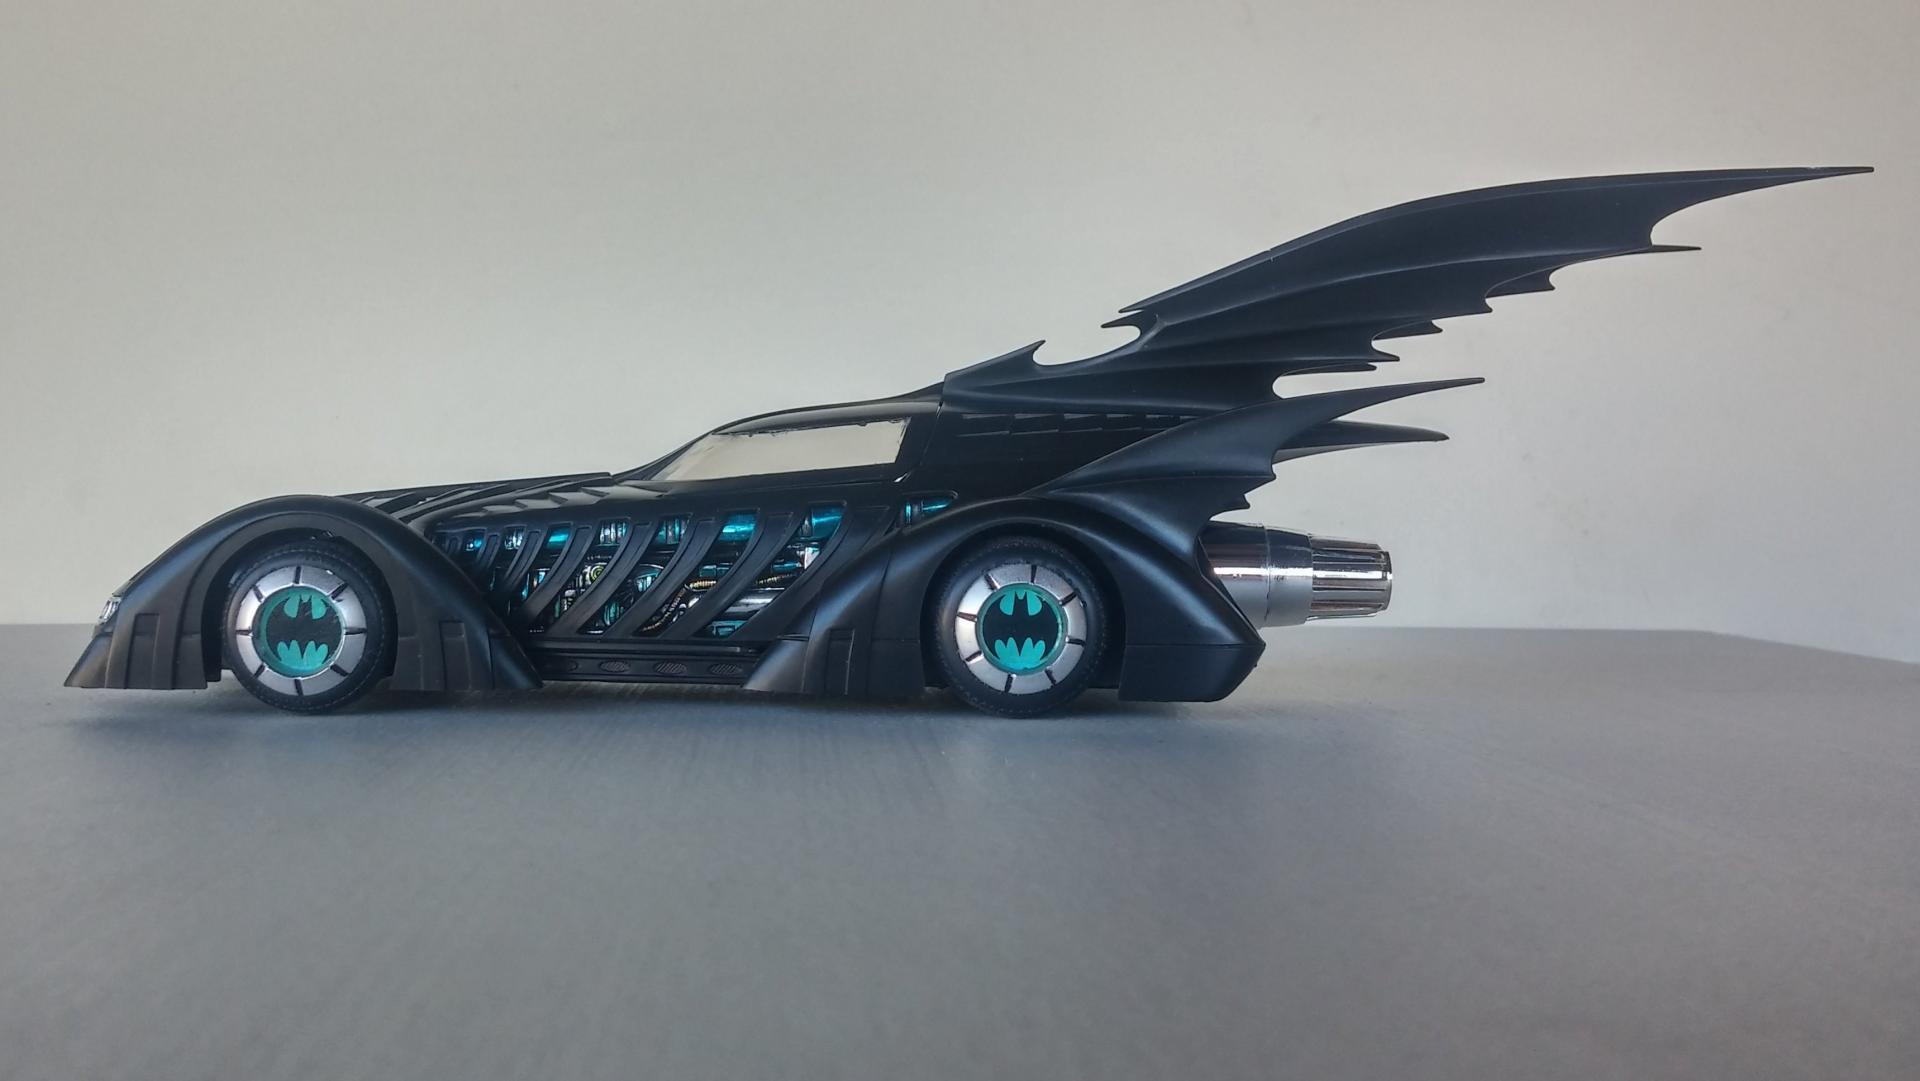 Batmobile_95_17.thumb.jpg.f9ddd8c861ba8b5462e2e9fd0f8eb65b.jpg